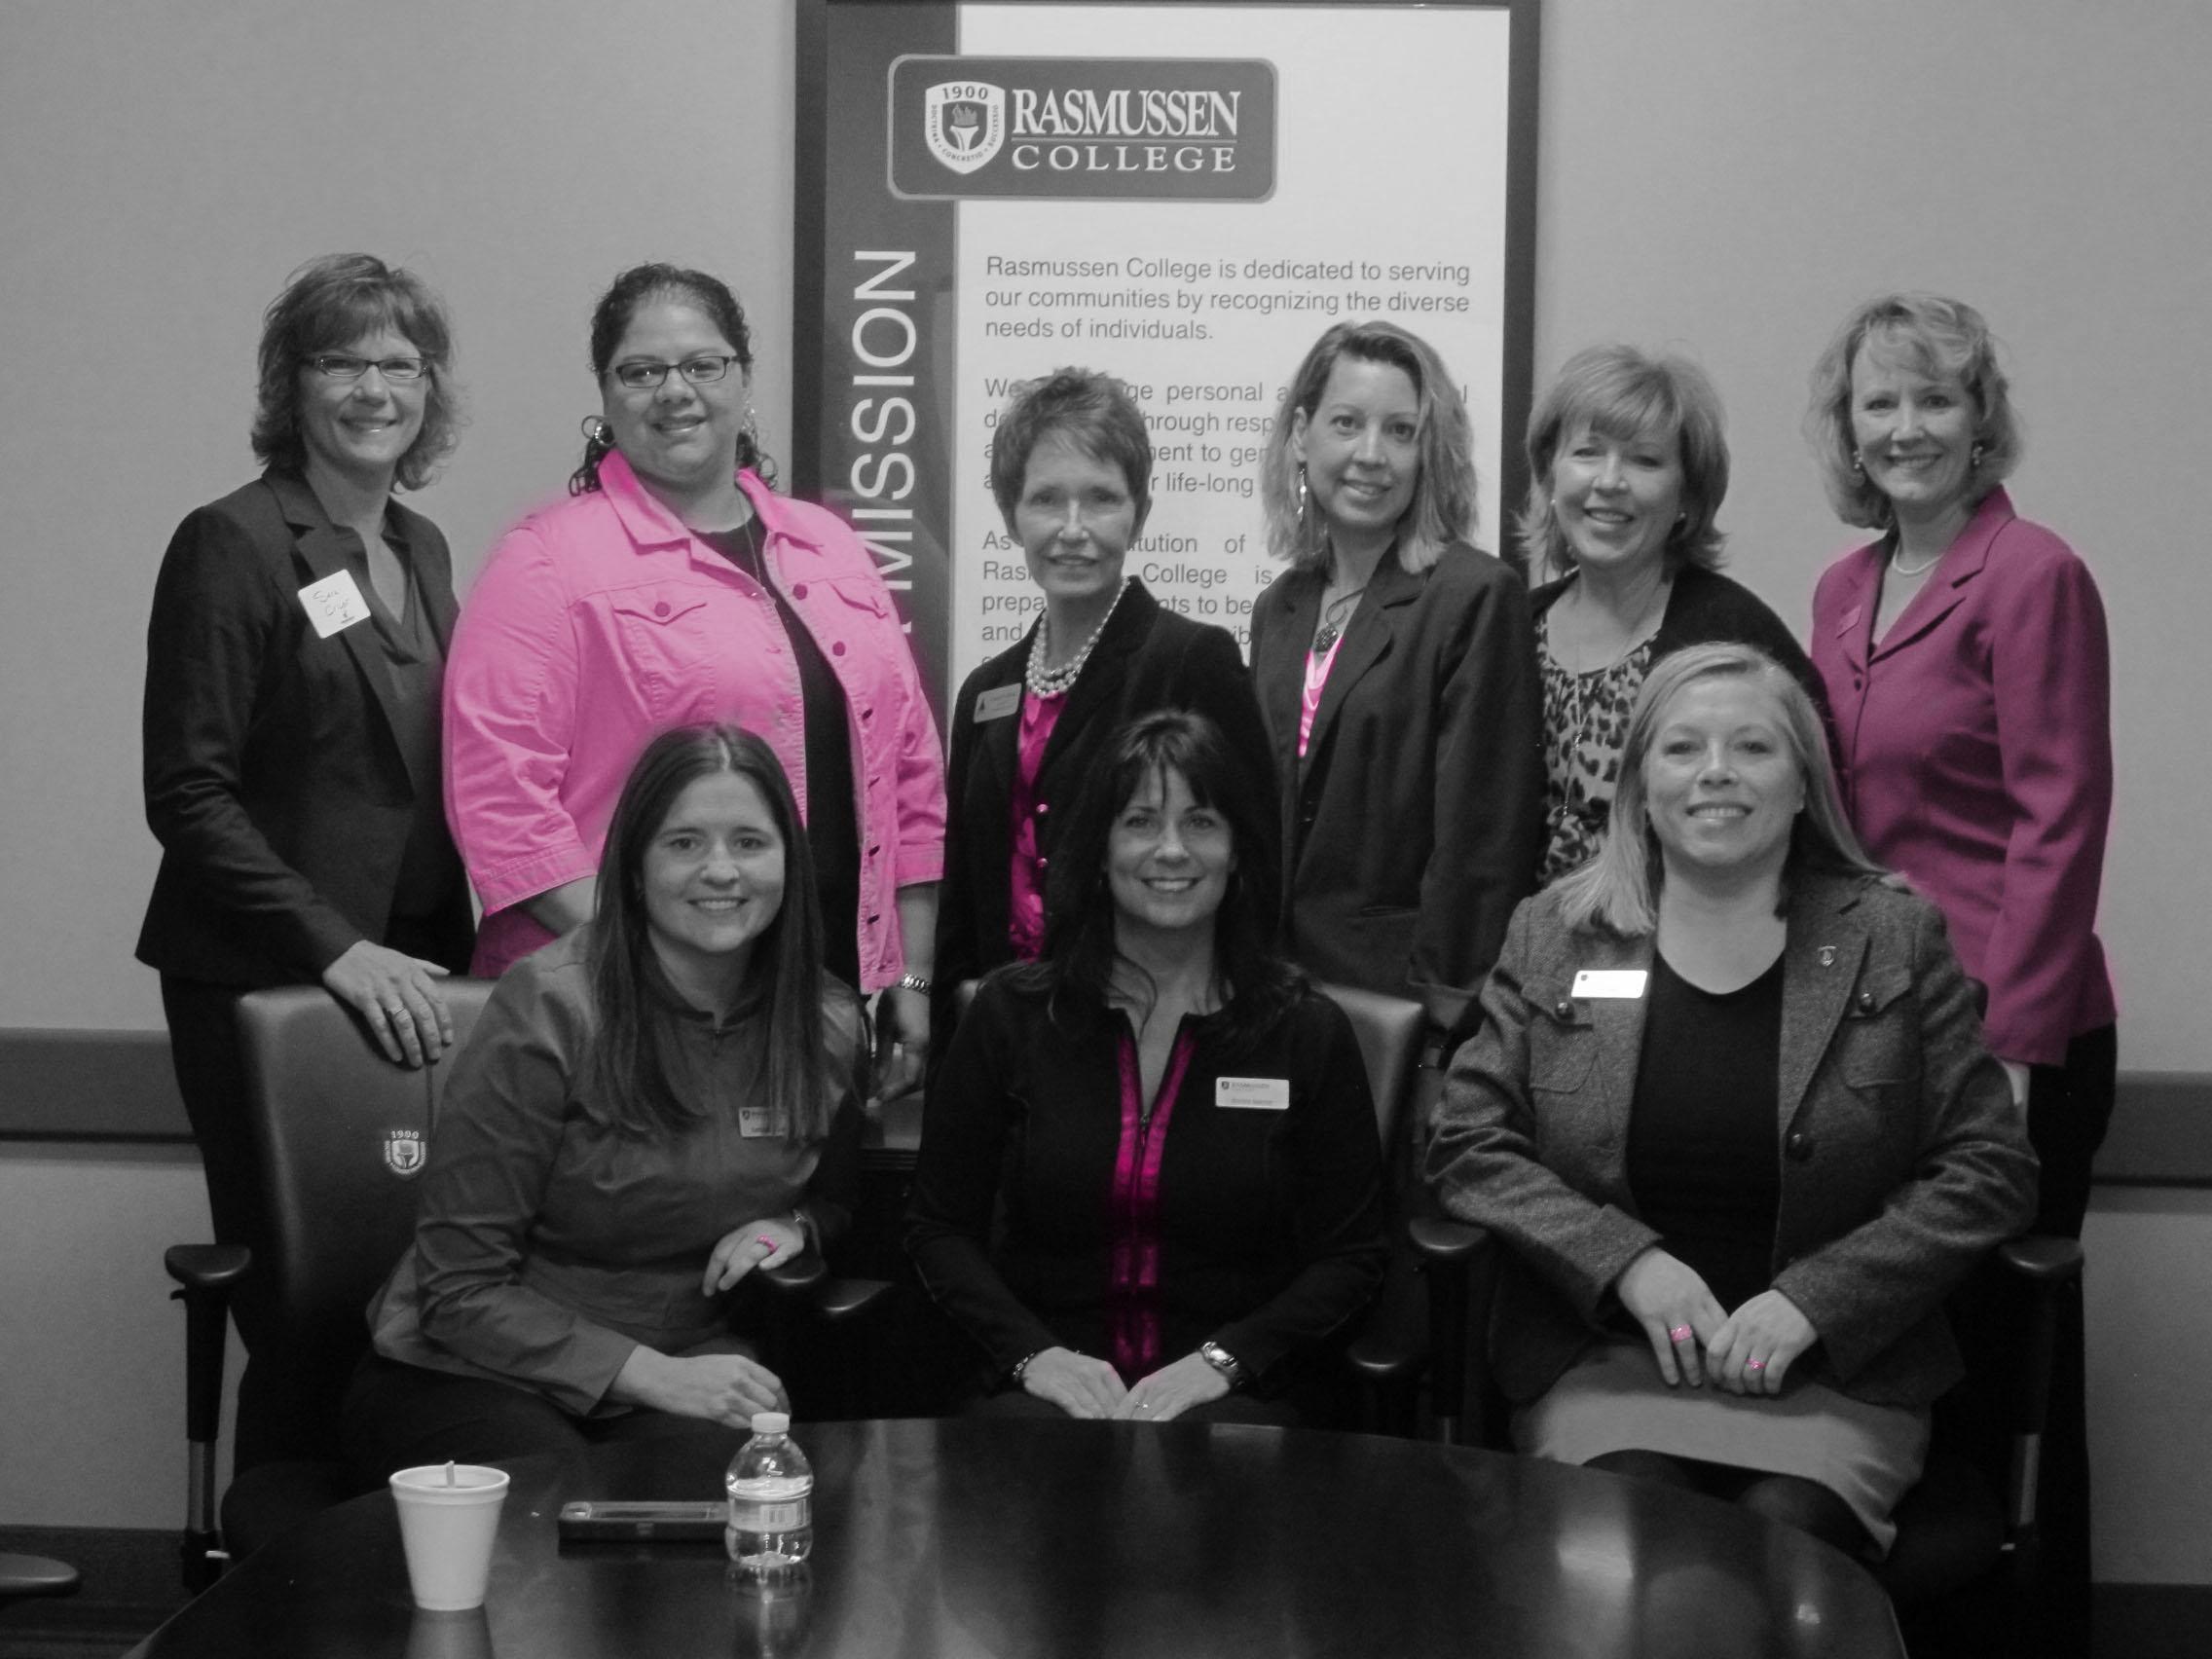 awe-women-empowerment-kristi-hemmer-leadership-panel.jpg